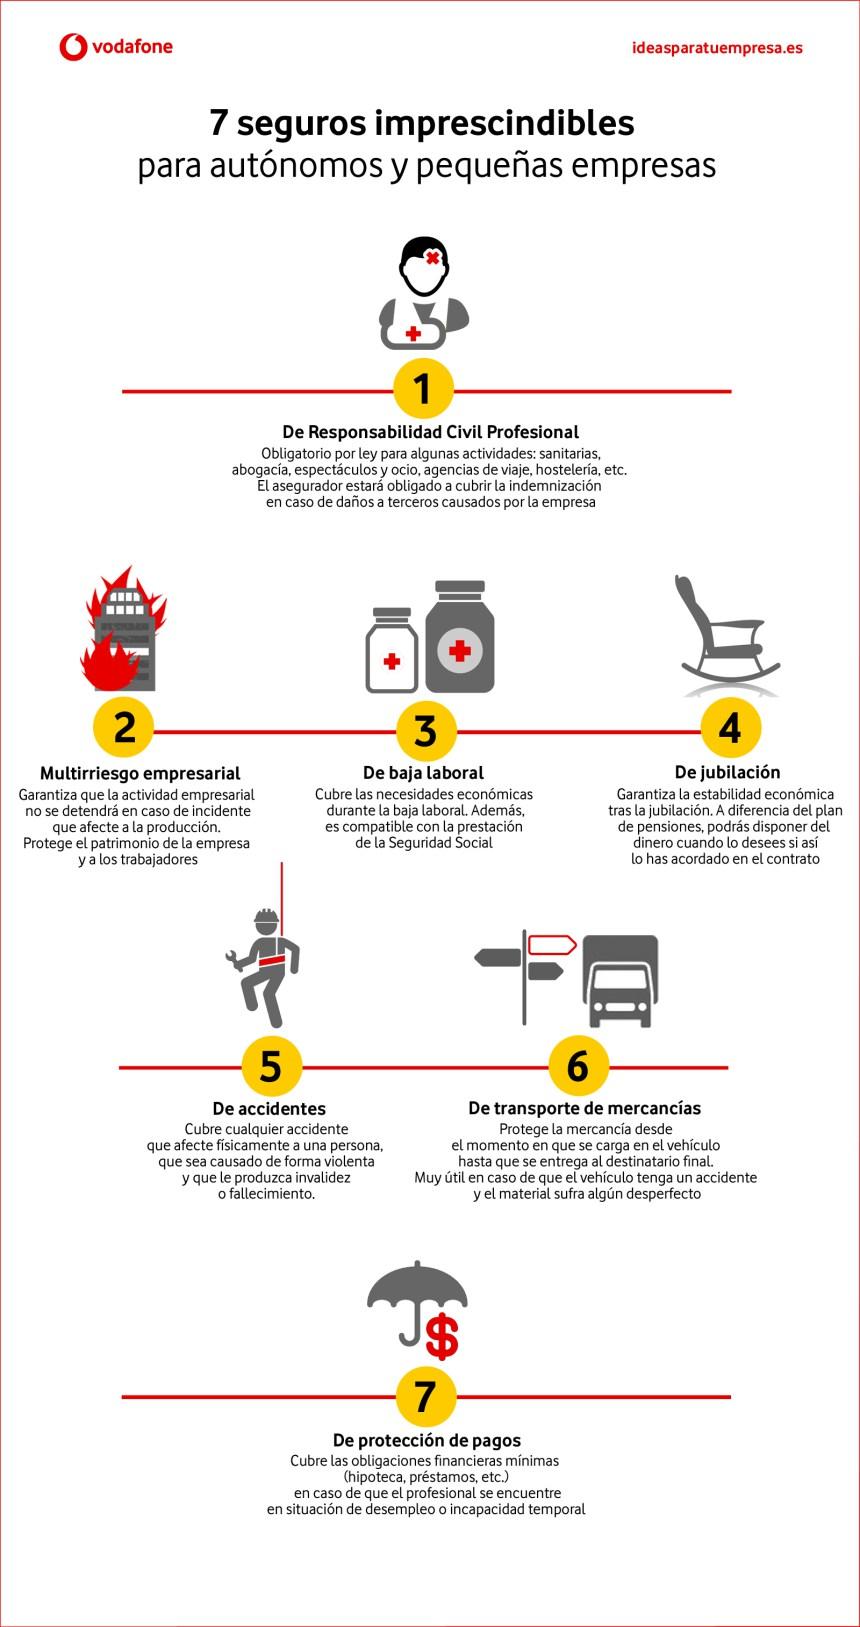 7 seguros imprescindibles para autónomos y pymes #infografia #infographic #entrepreneurship